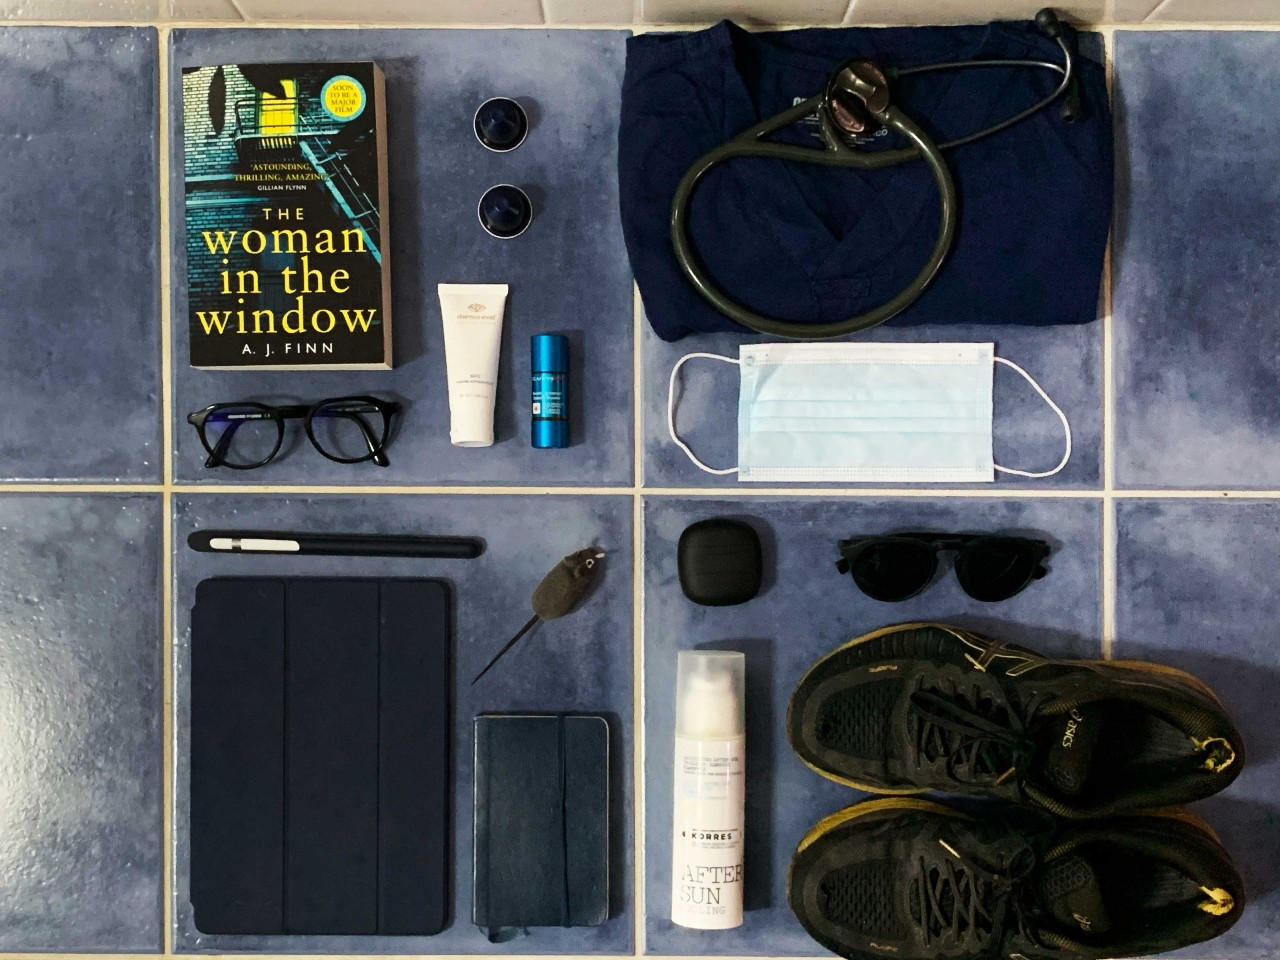 Lockdown essentials by Rui Baptista Gonçalves, Portugal